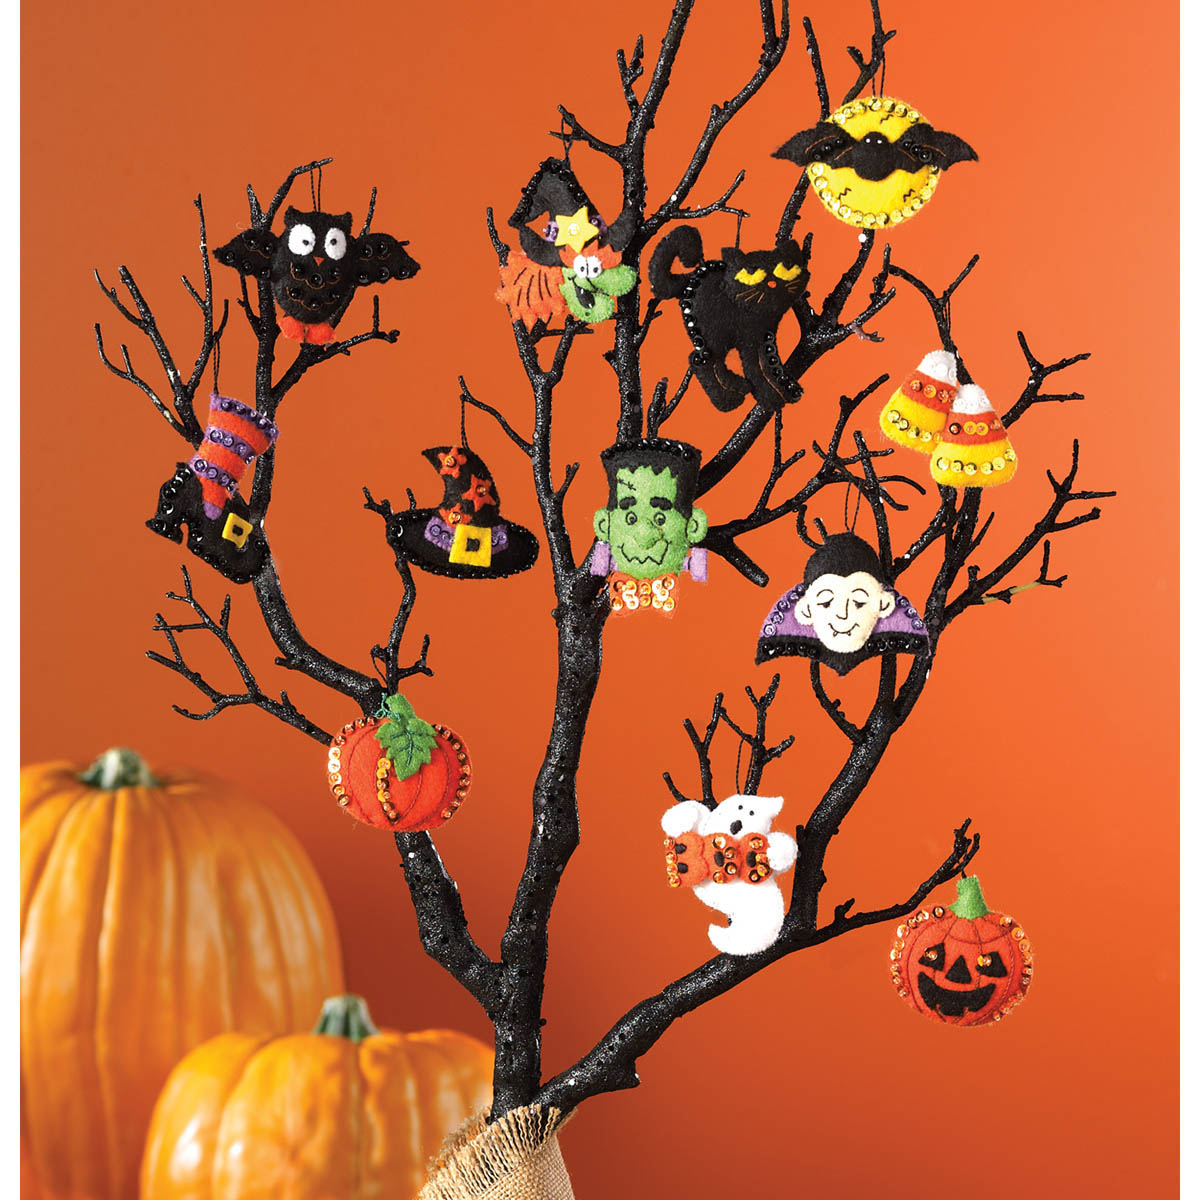 Bucilla ® Seasonal - Felt - Ornament Kits - Halloween